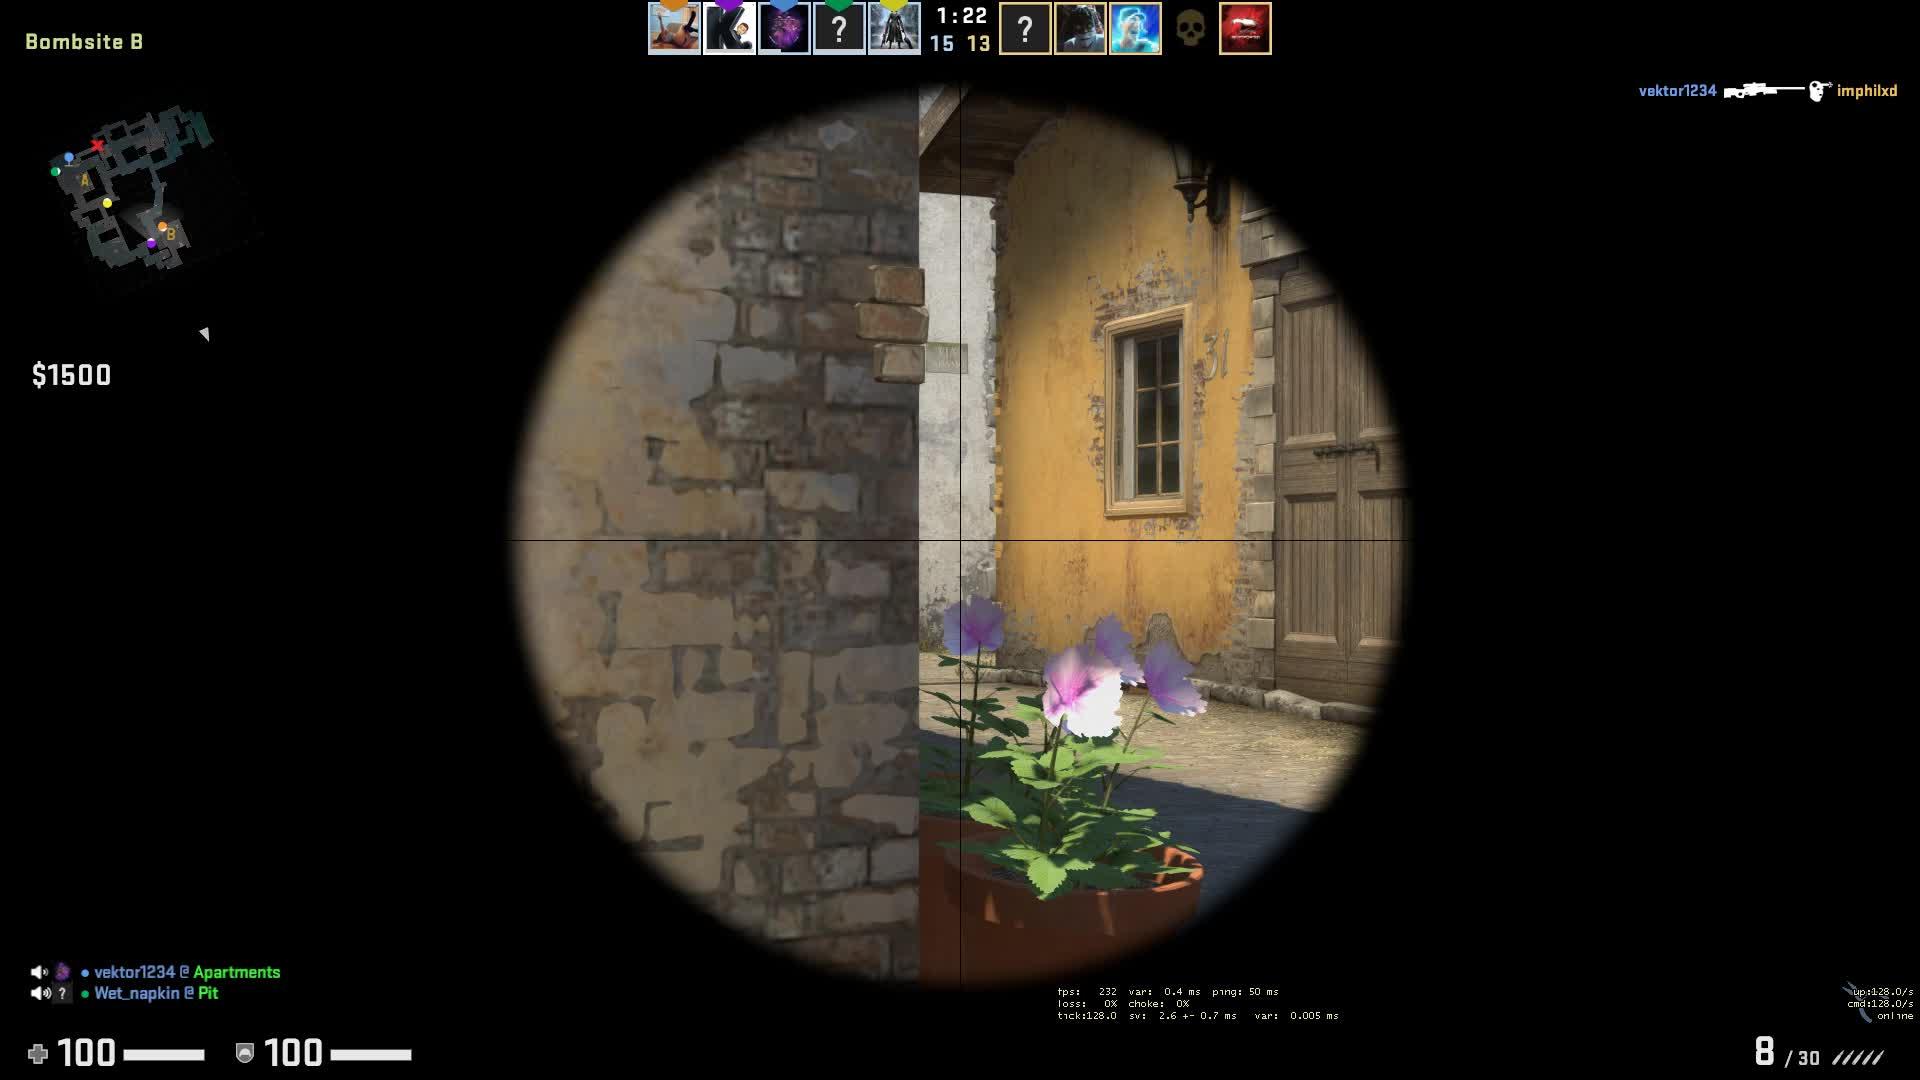 CS:GO, GlobalOffensive, awp, counter strike, counter strike global offensive, csgo, headshot, awp quick 4 kills - csgo GIFs